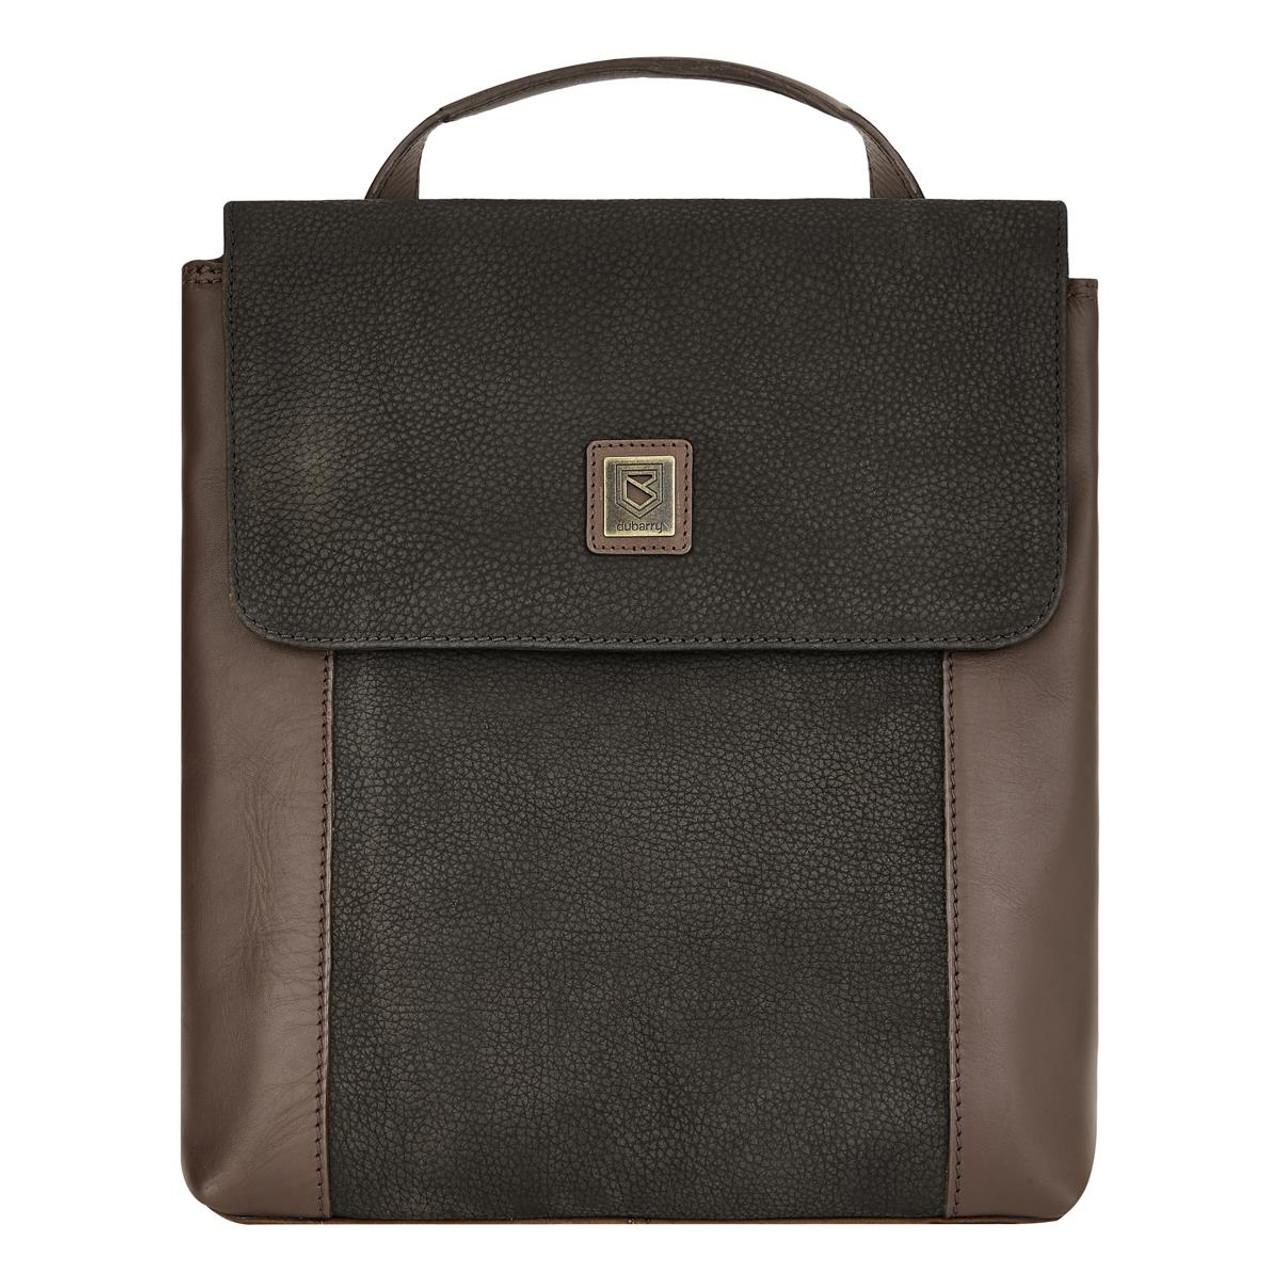 Dubarry Dingle Bag